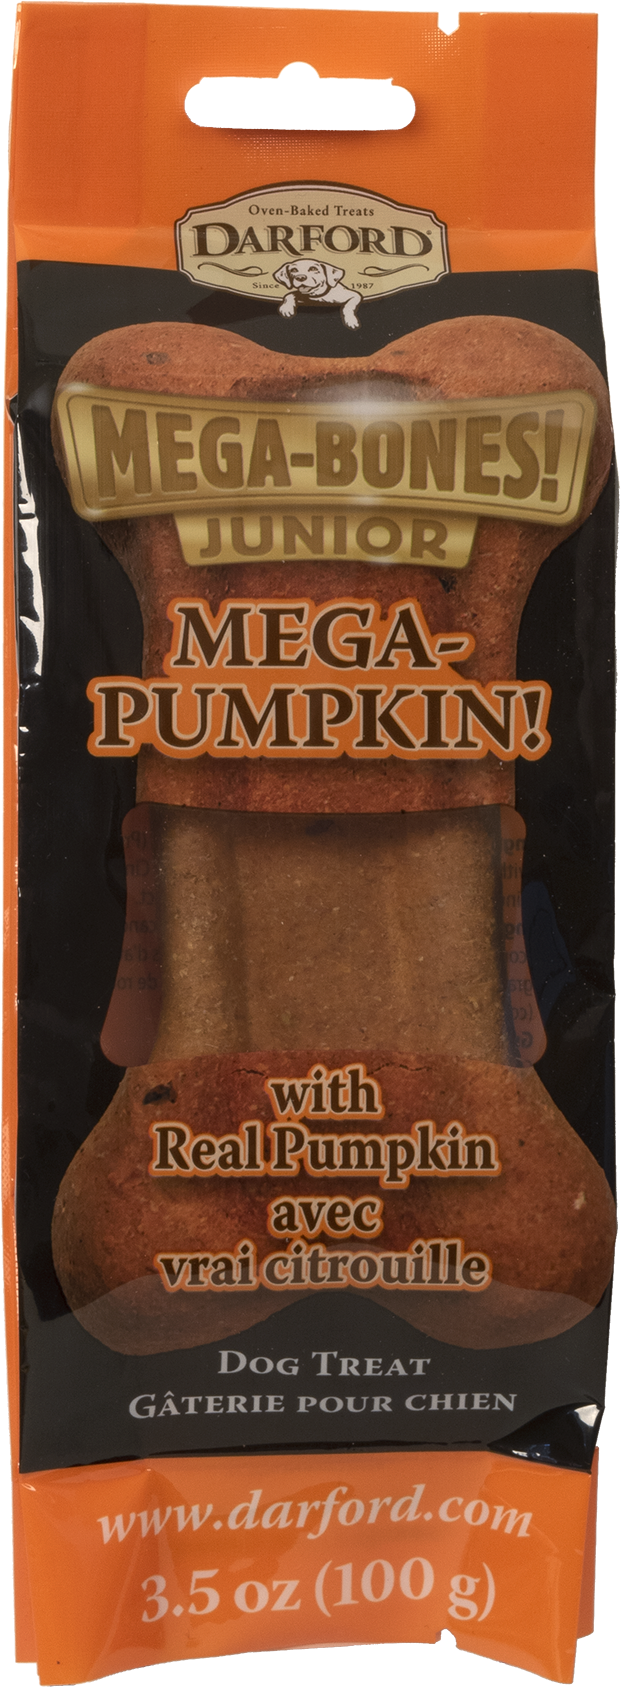 Darford Mega Pumpkin Junior Bone Dog Treat, 3.5-oz